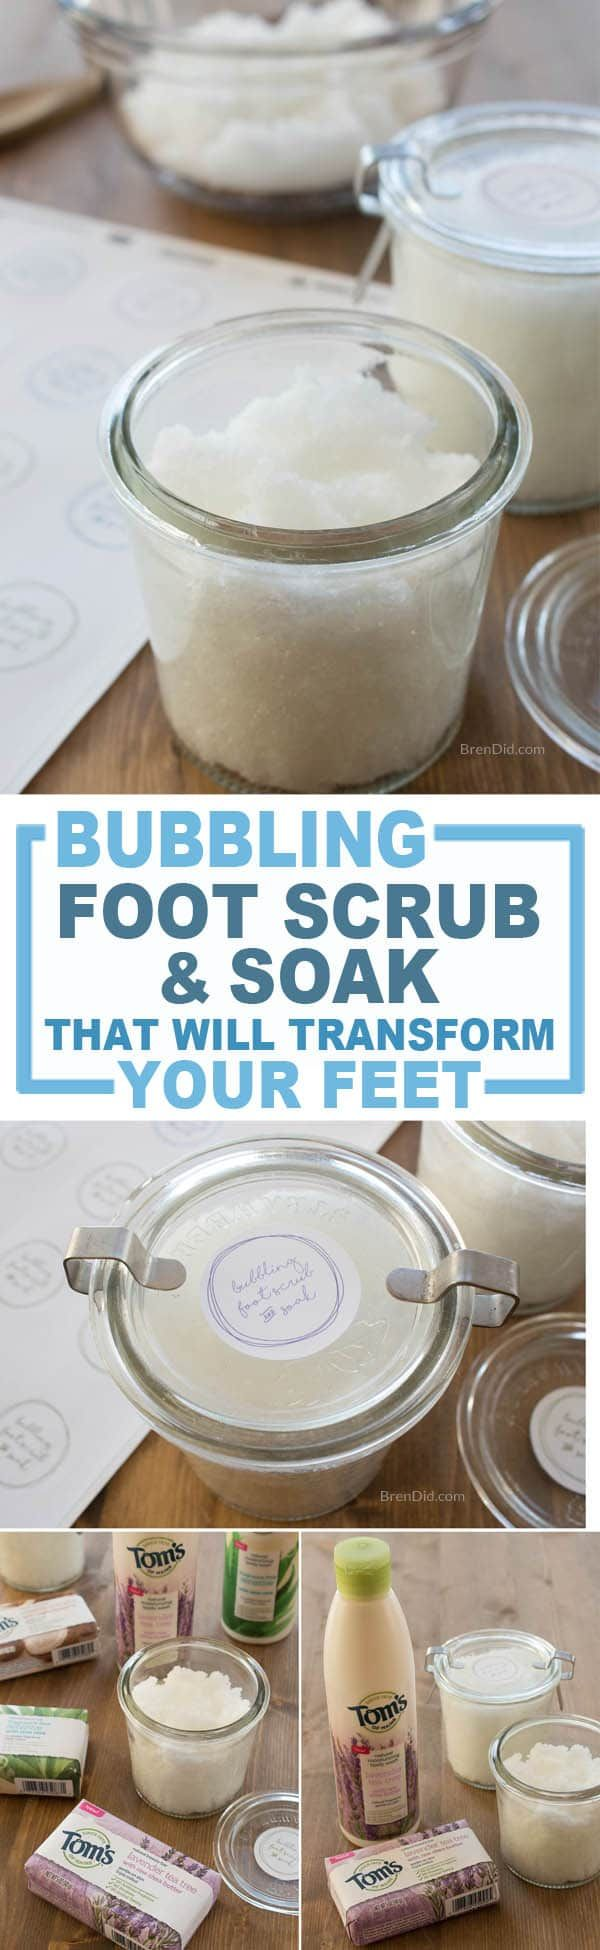 bubbling foot scrub & soak, DIY foot scrub, homemade foot scrub, DIY callus remover, dry skin remover, homemade foot soak, #naturallyinspired #sponsored via @brendidblog